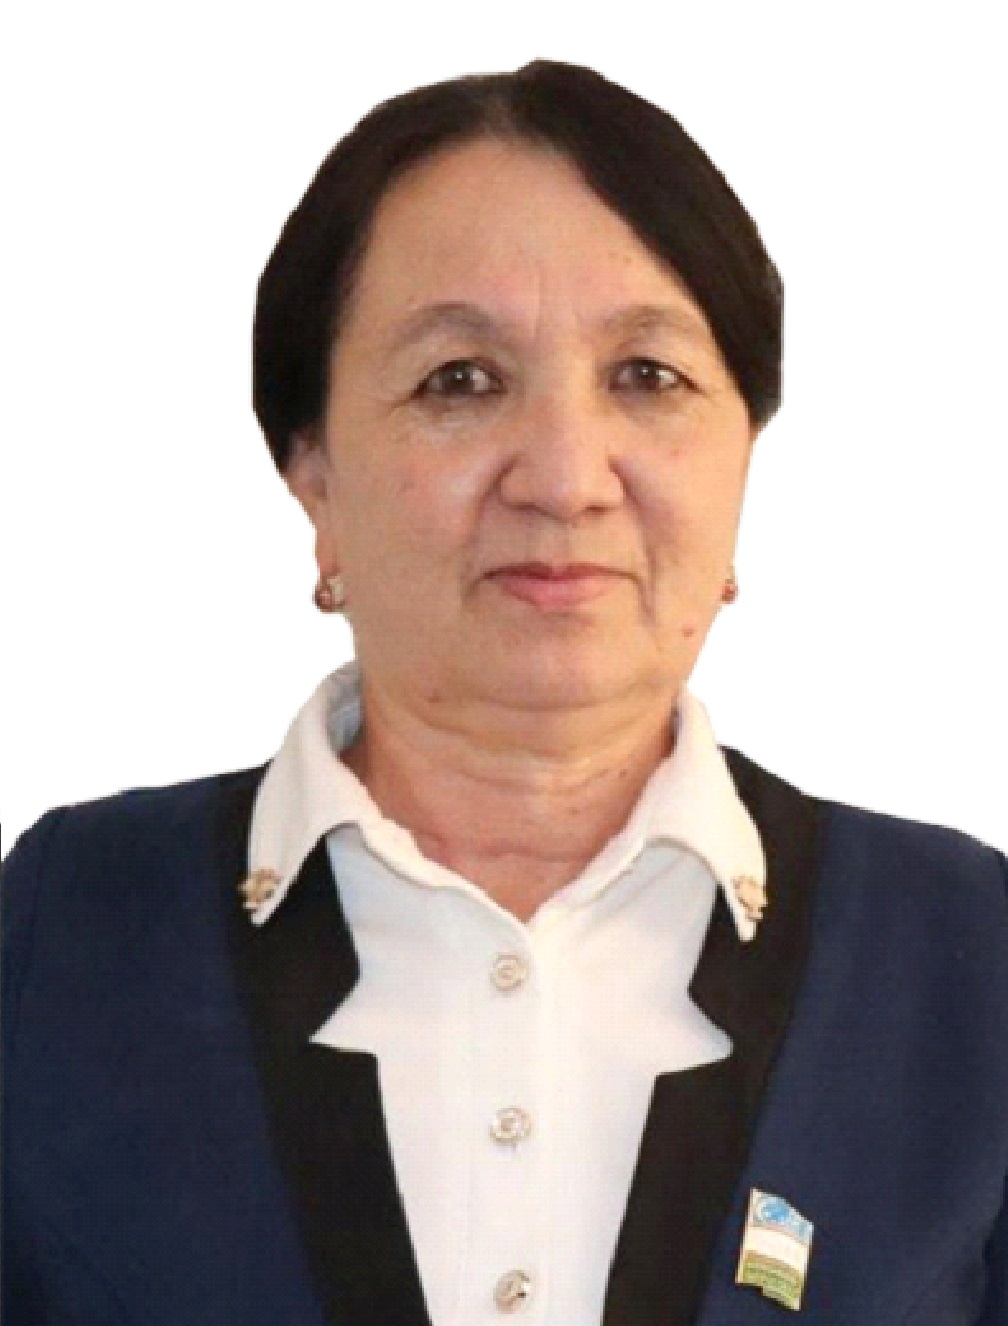 Камолова Мубина Бахшуллаевна